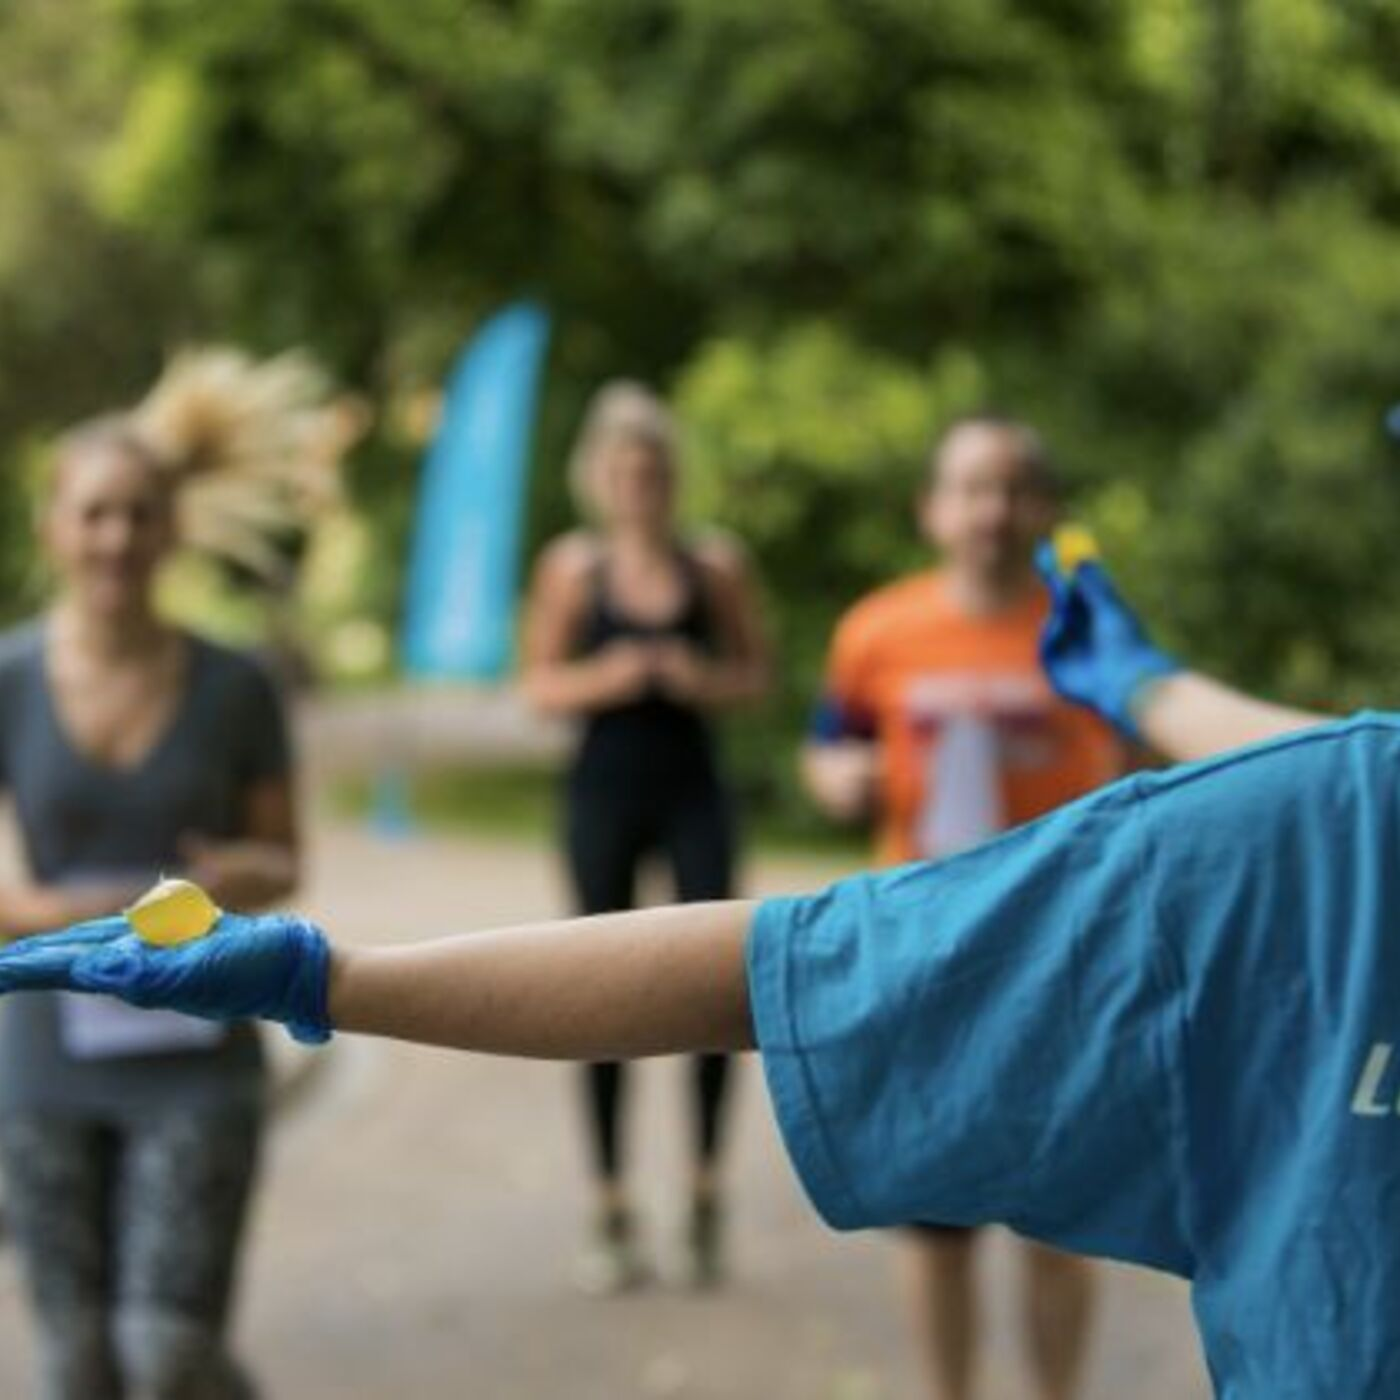 Ooho: Edible Water Bottles for Races